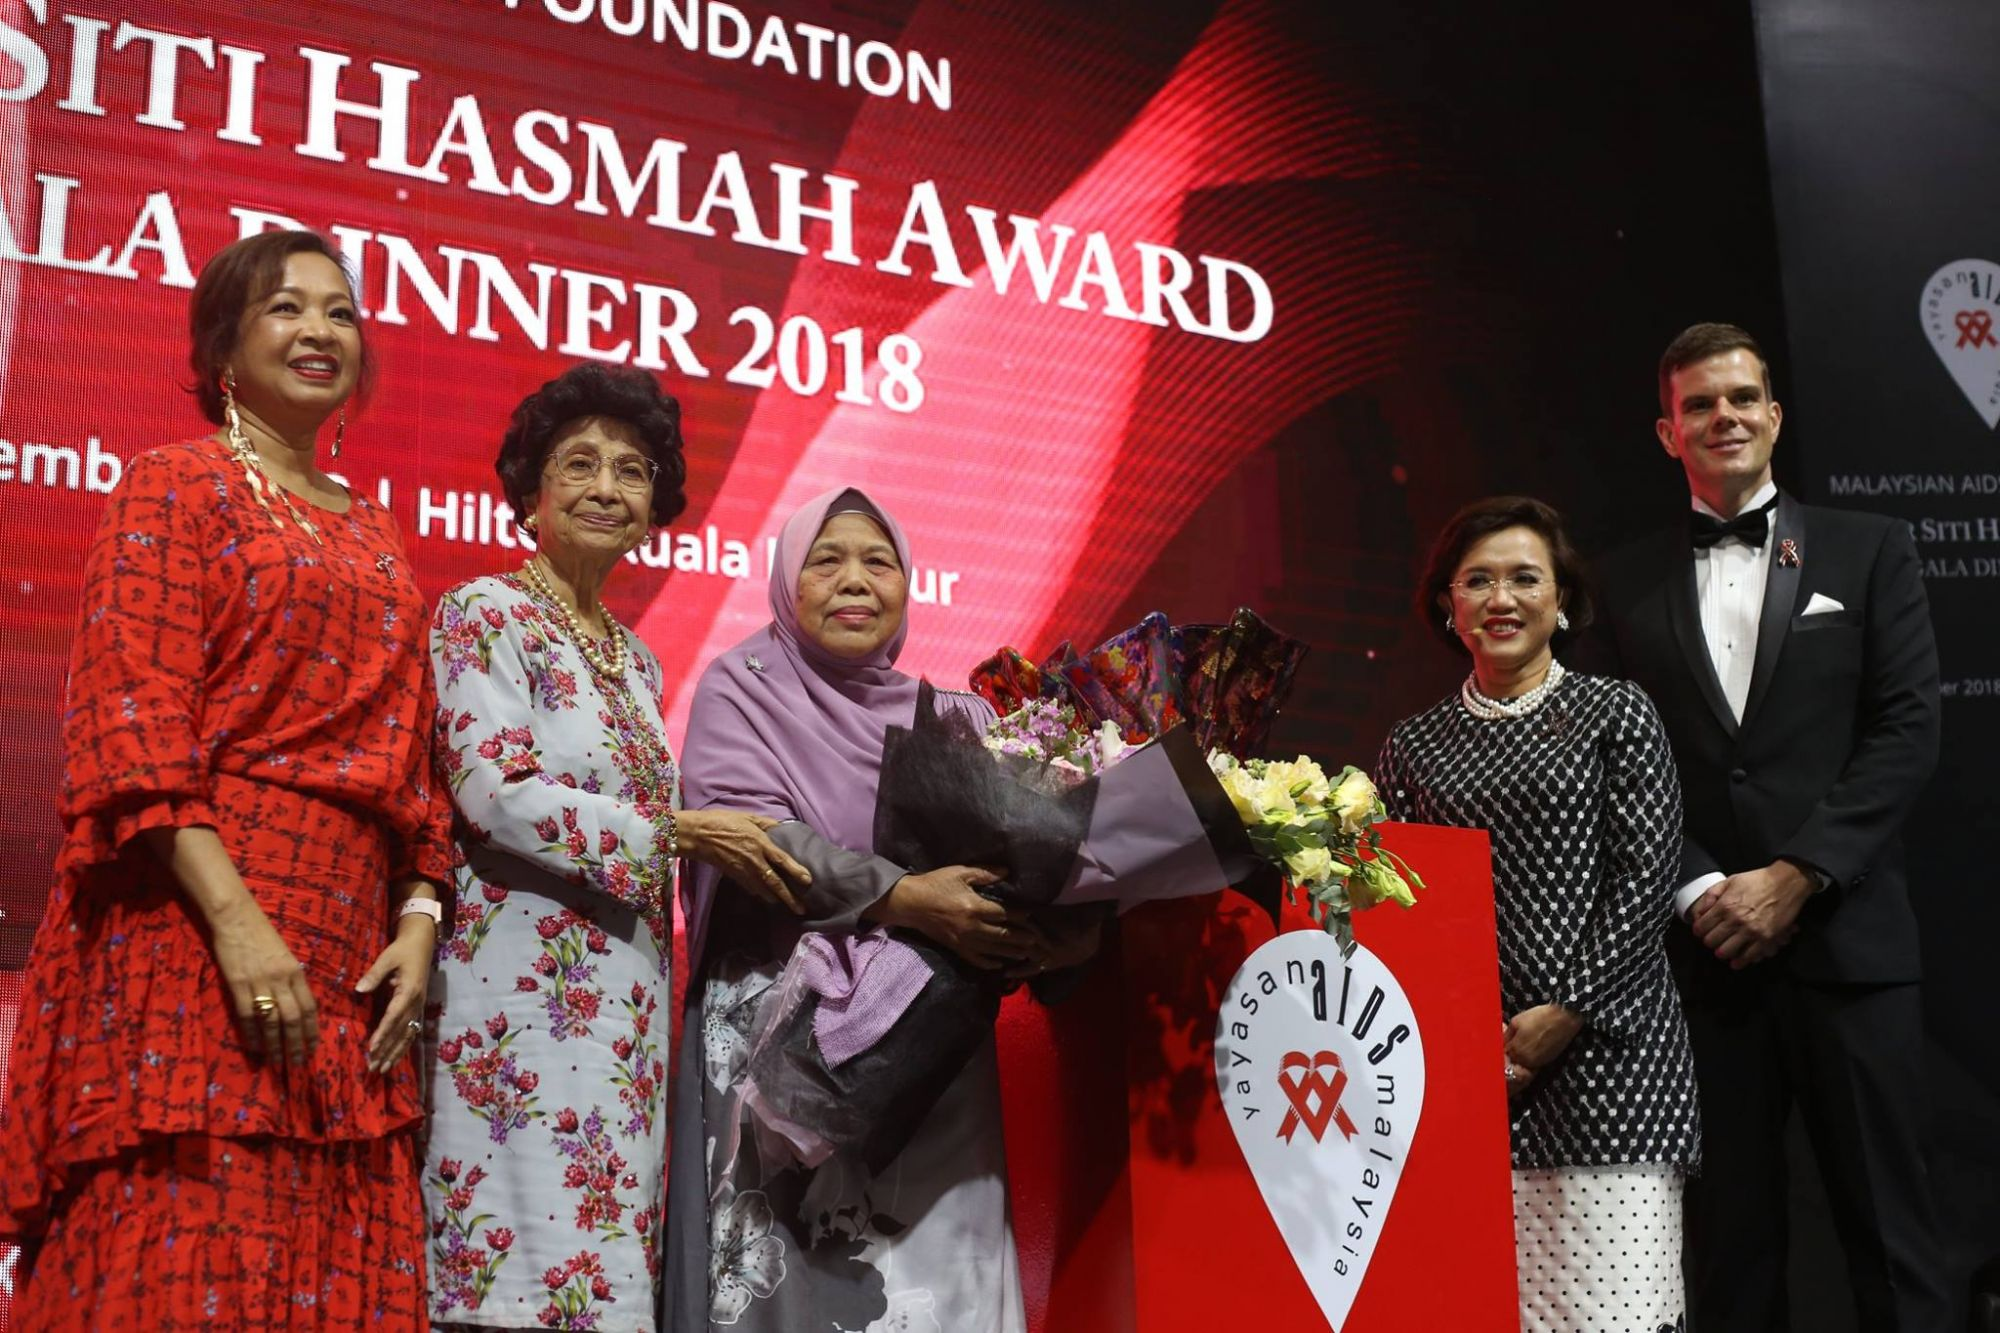 Malaysia AIDS Foundation Charity Gala Dinner 2018